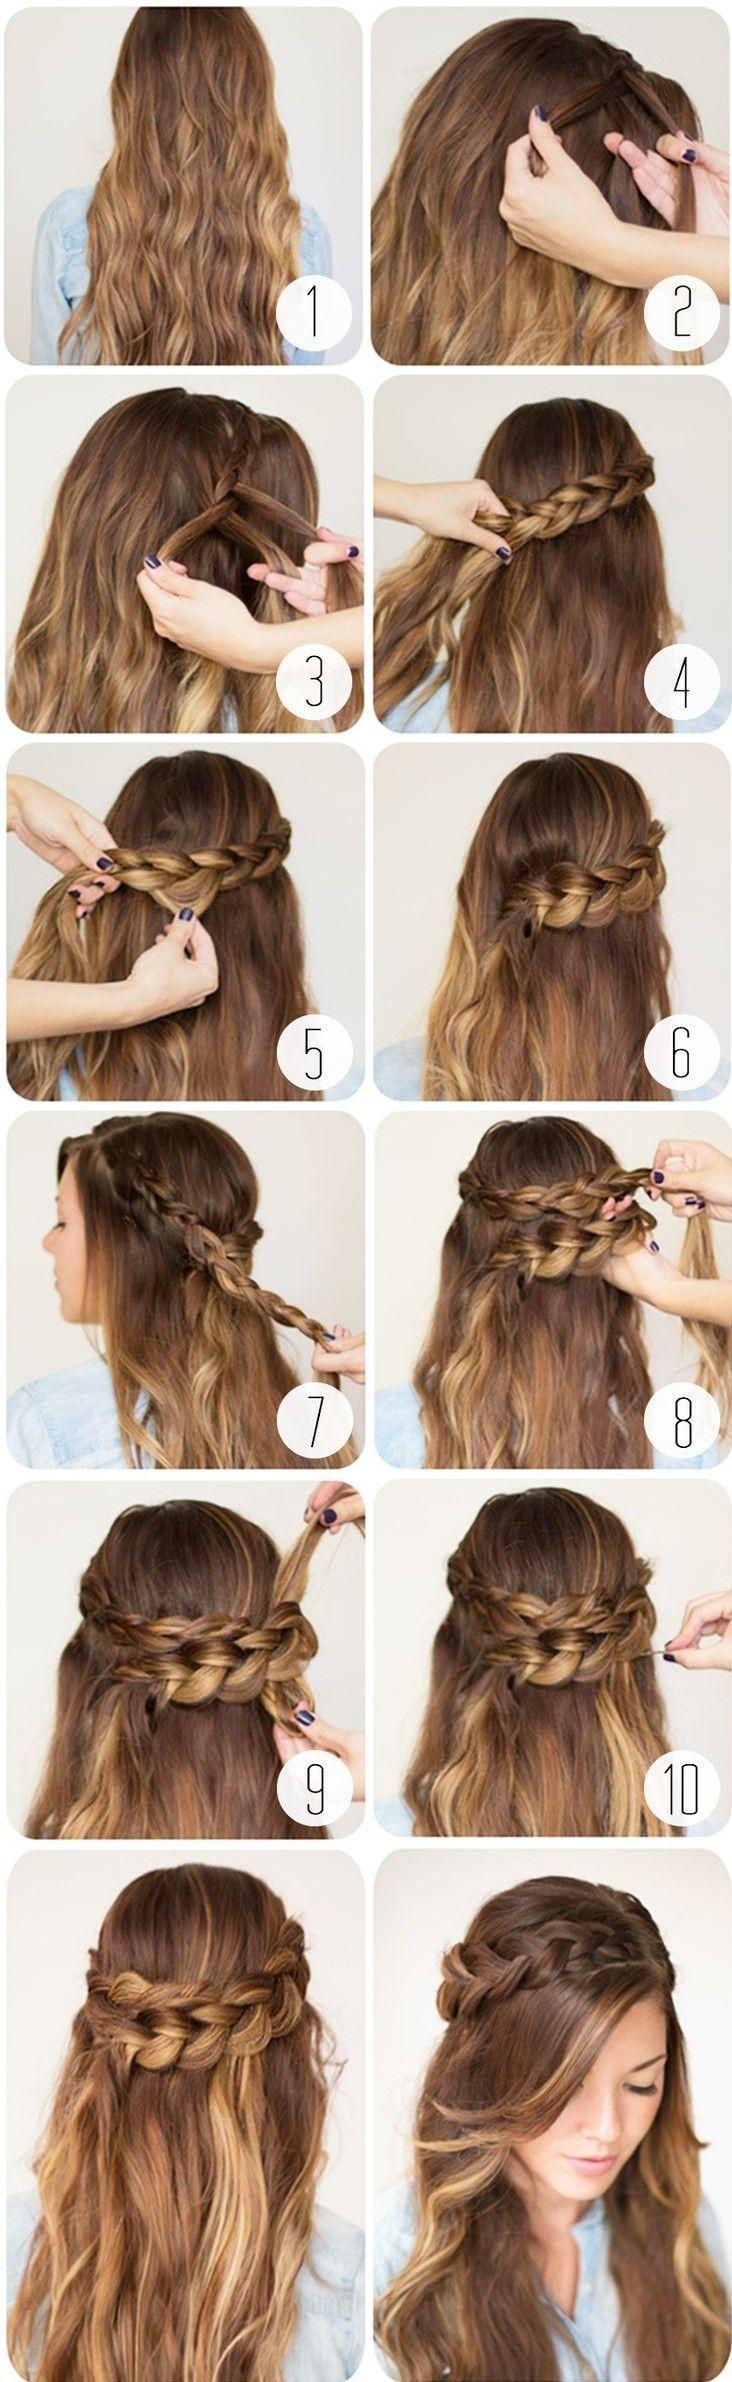 Phenomenal 1000 Ideas About Different Braids On Pinterest Different Braid Hairstyles For Women Draintrainus